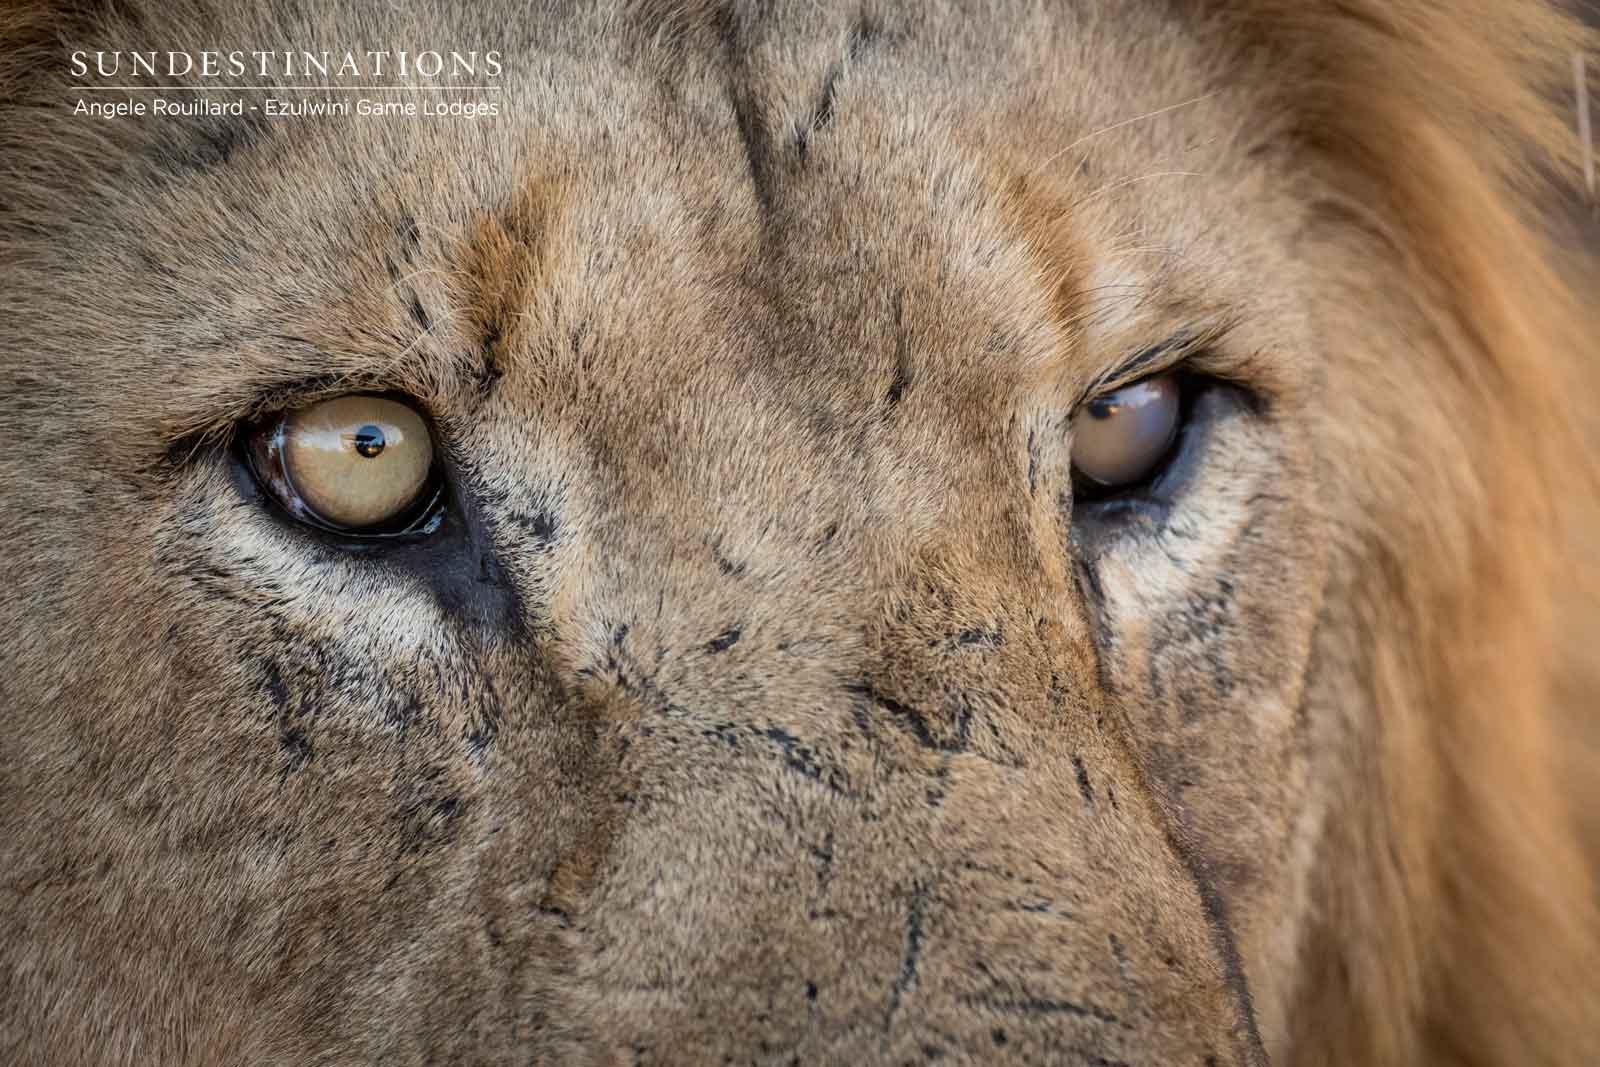 Lions at Ezulwini